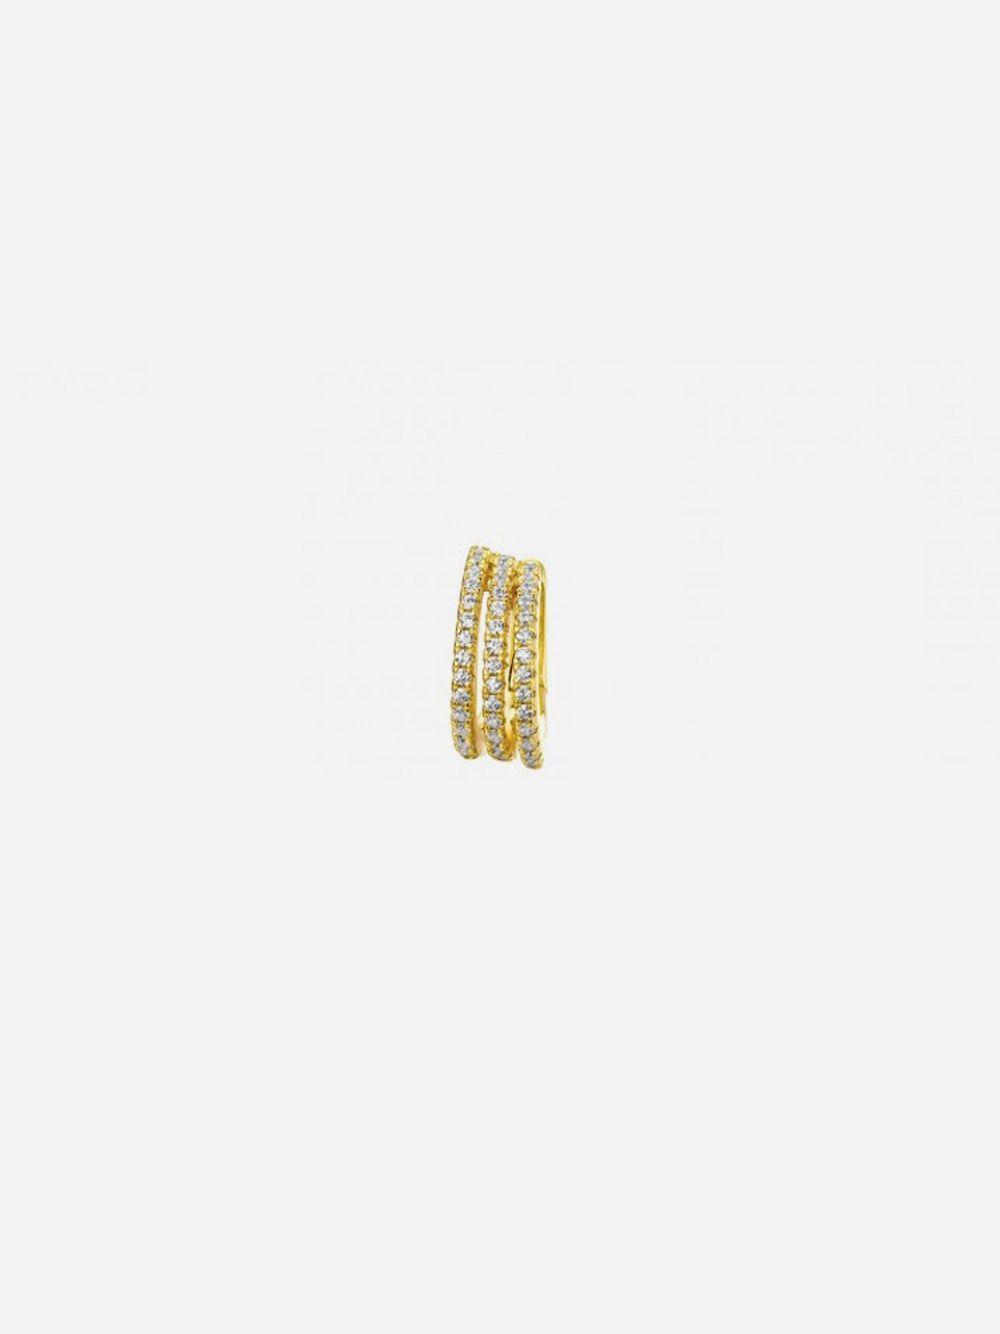 Shine Ear Cuff Earring | Seni Jewellery